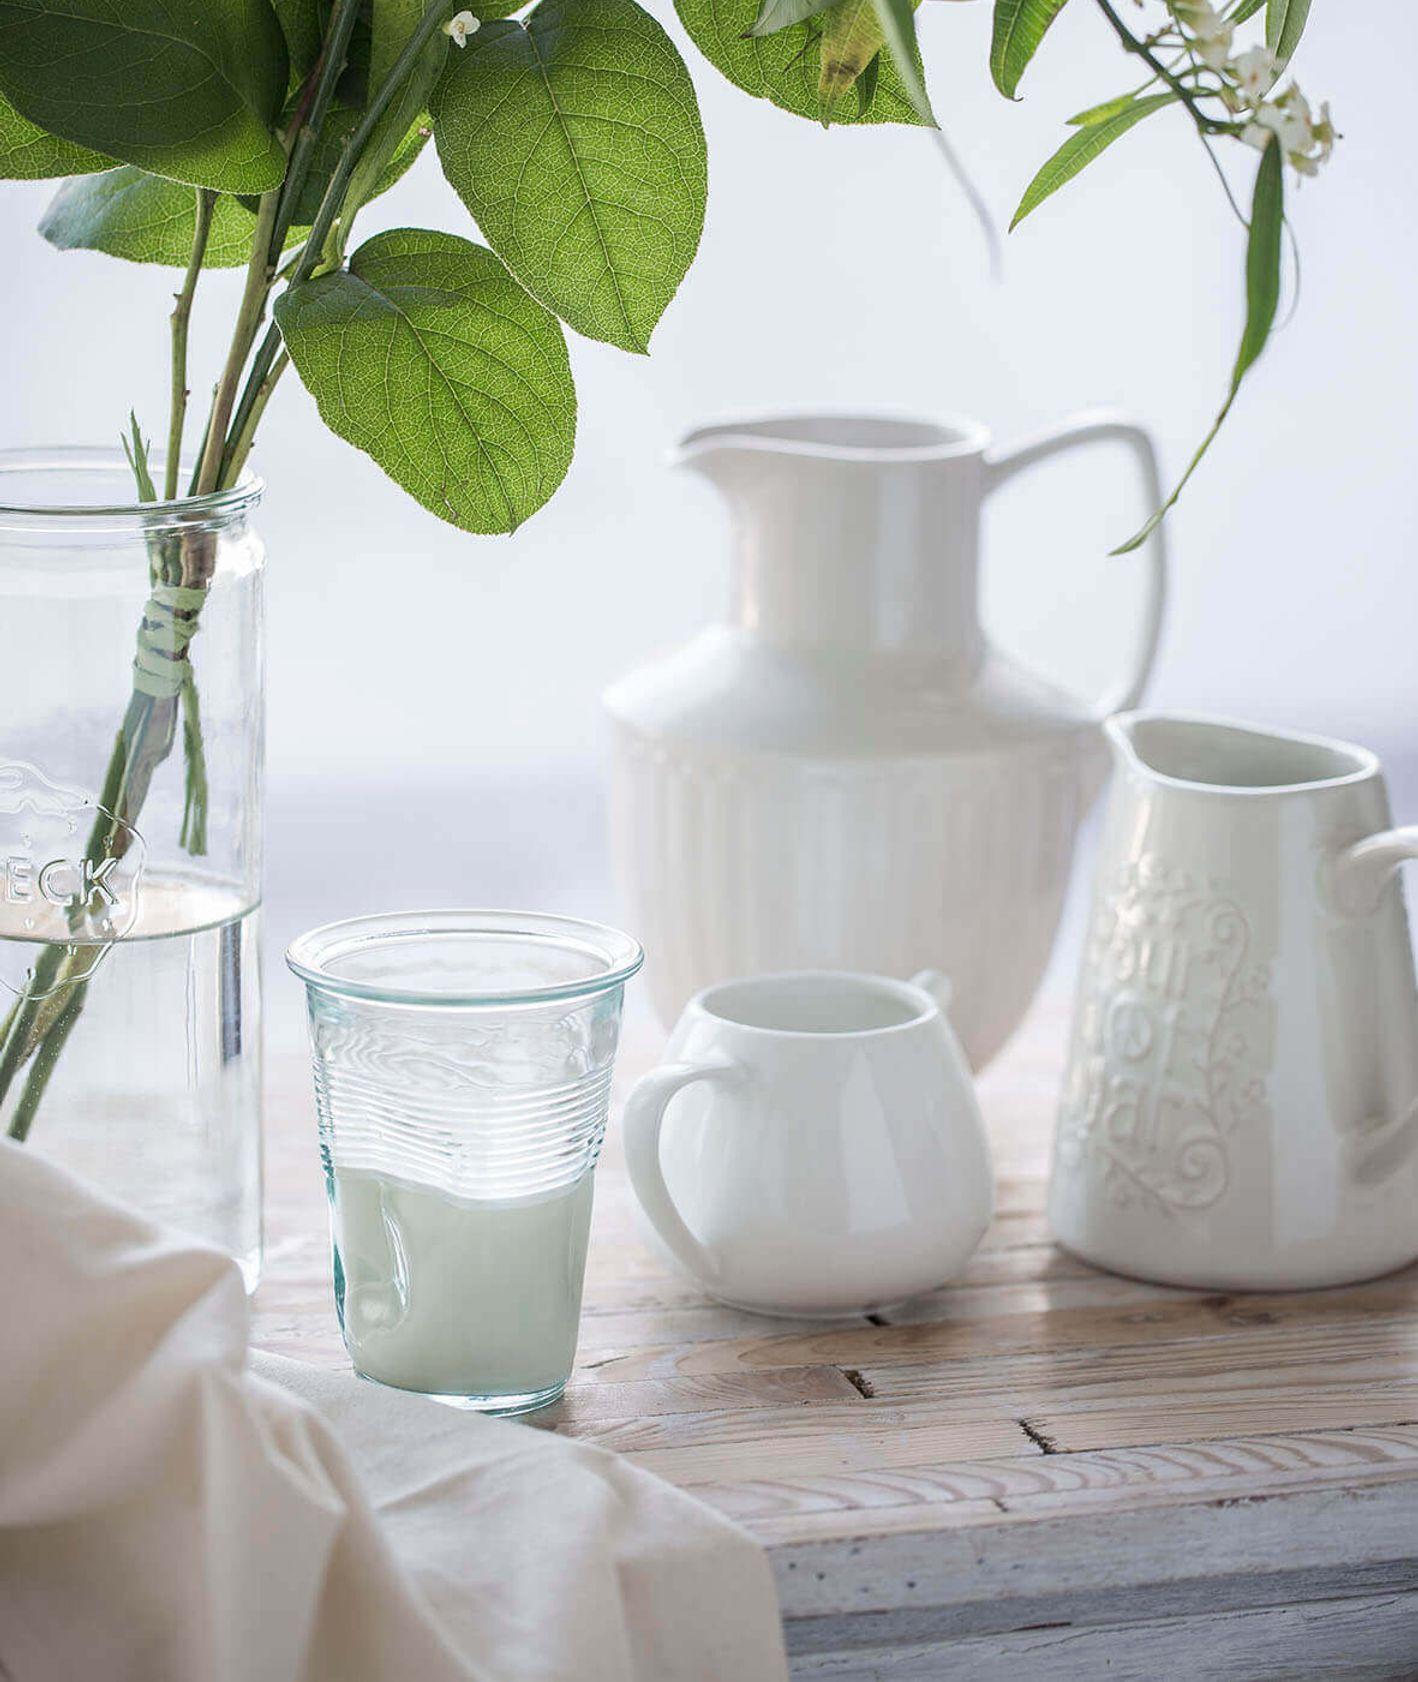 Domowe mleko roślinne - dieta wegańska